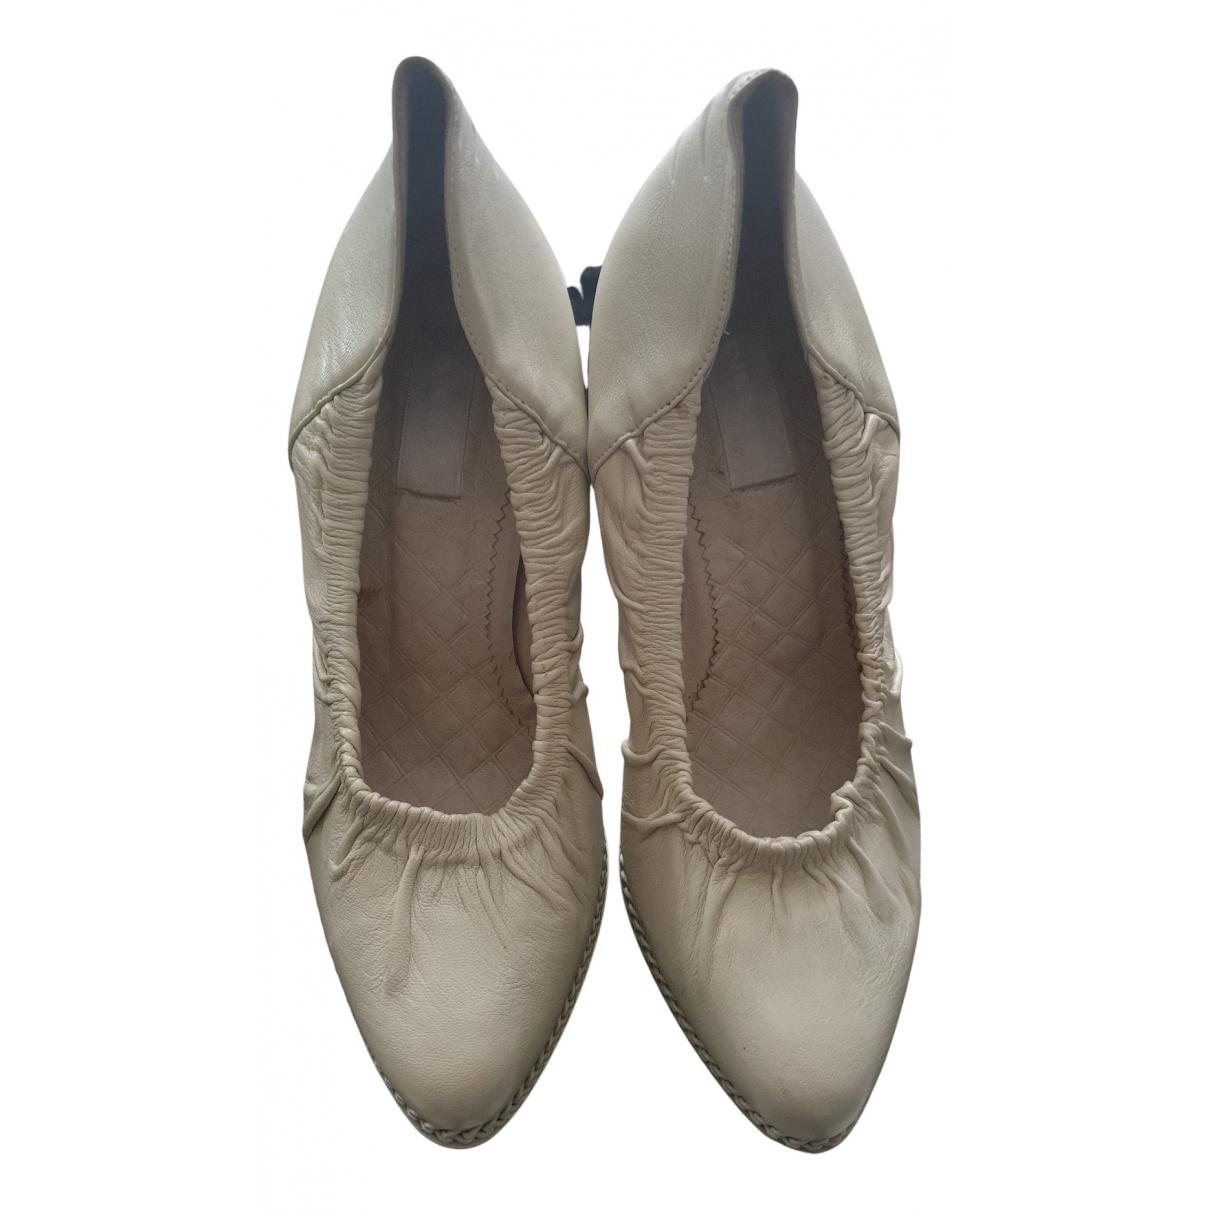 Diesel N Beige Leather Heels for Women 38 EU